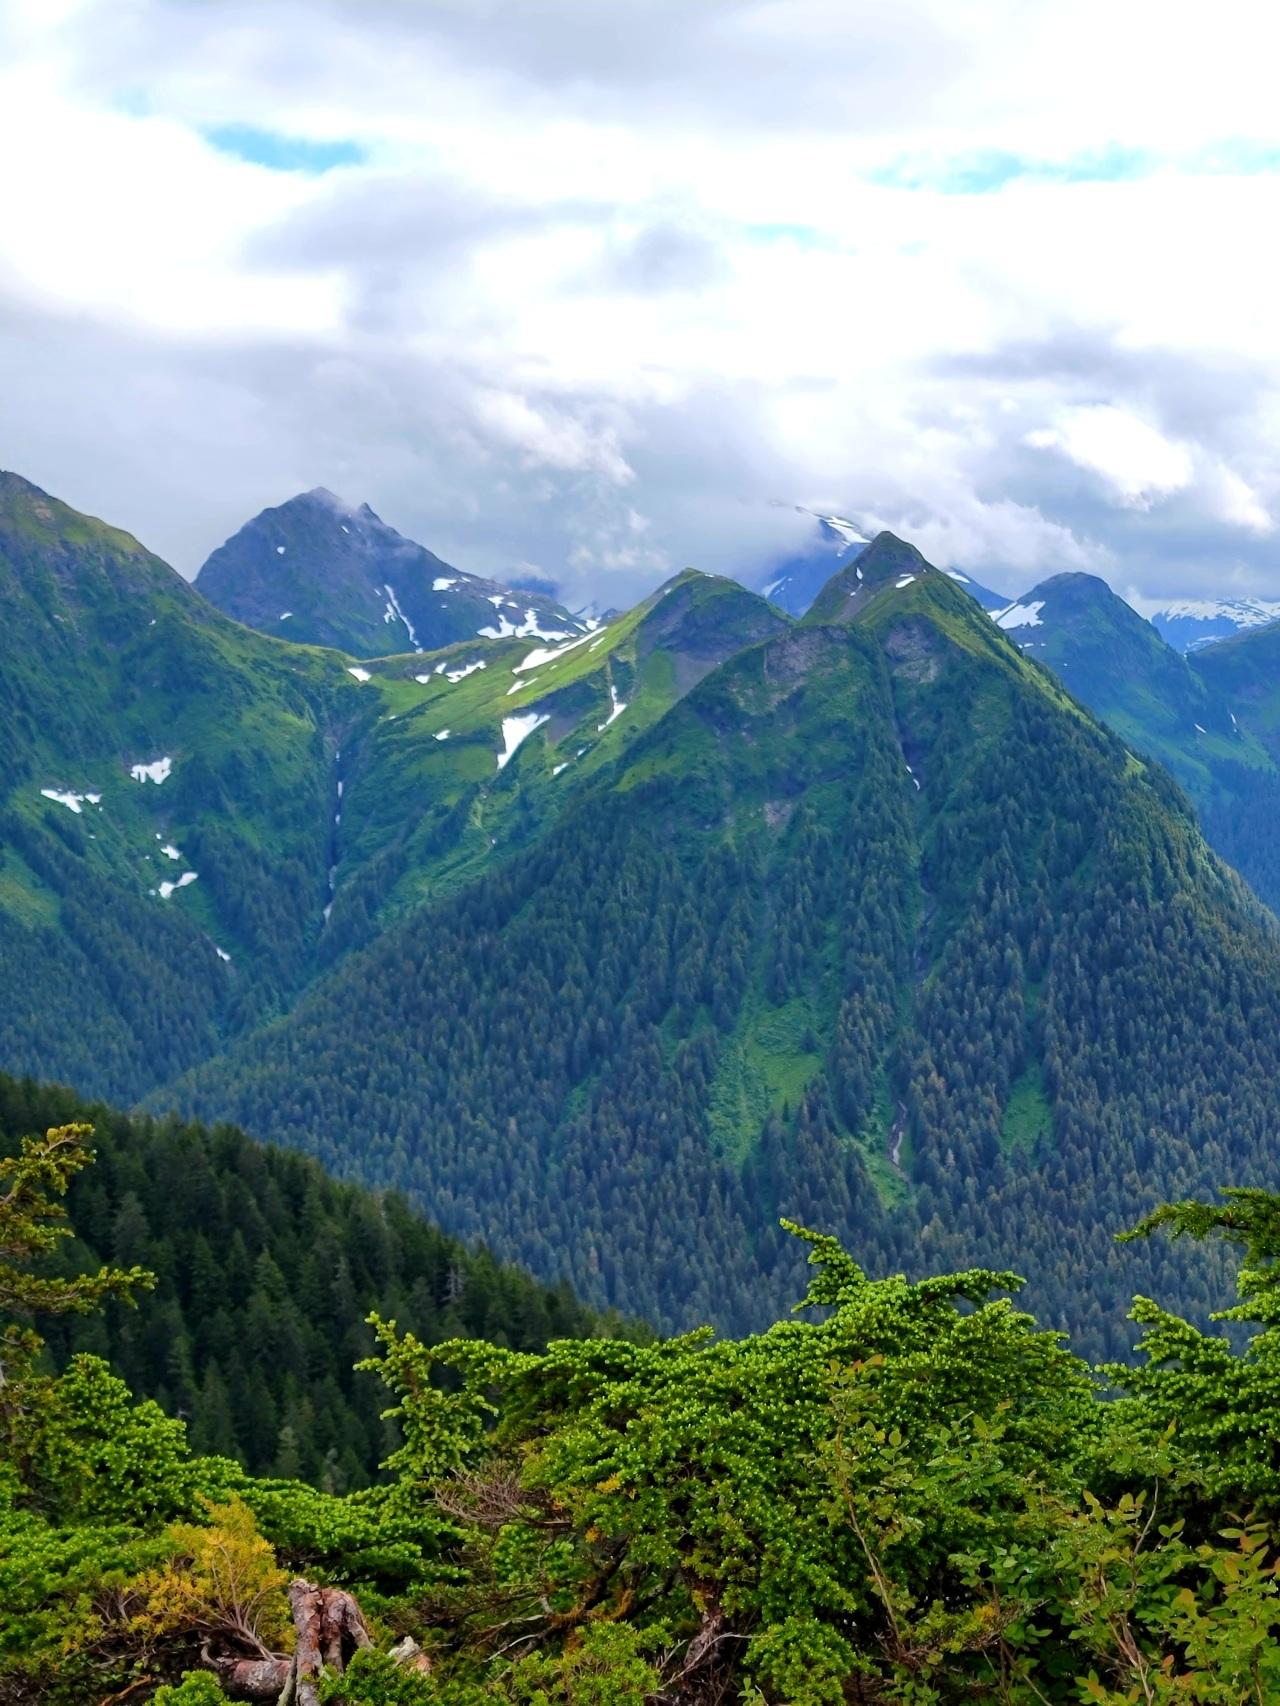 Alaska — the lastfrontier